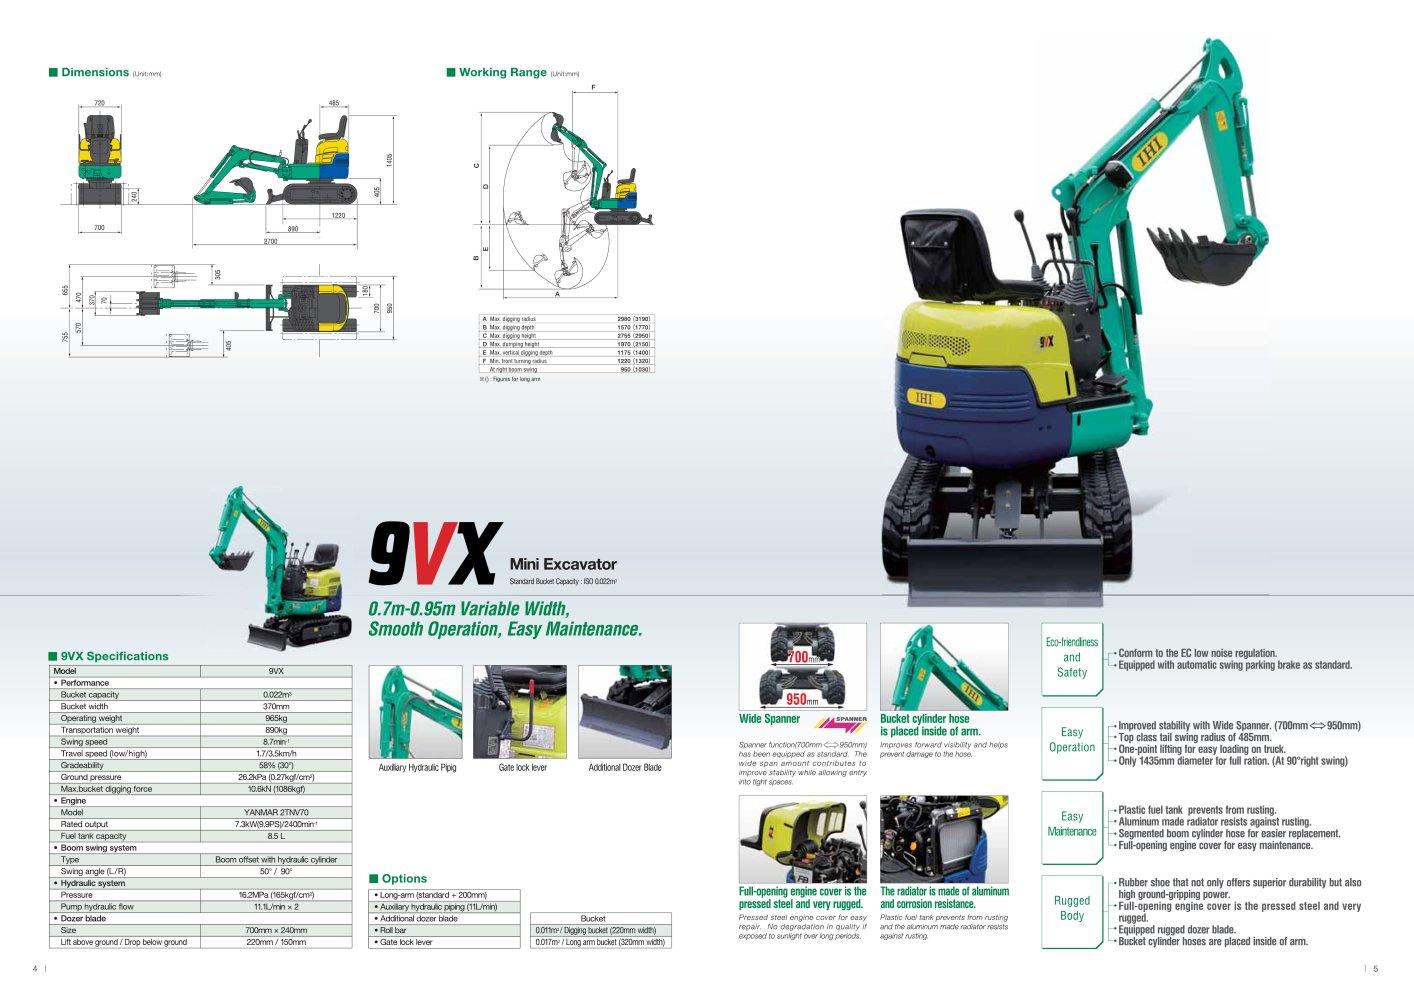 Mini Excavator 9VX